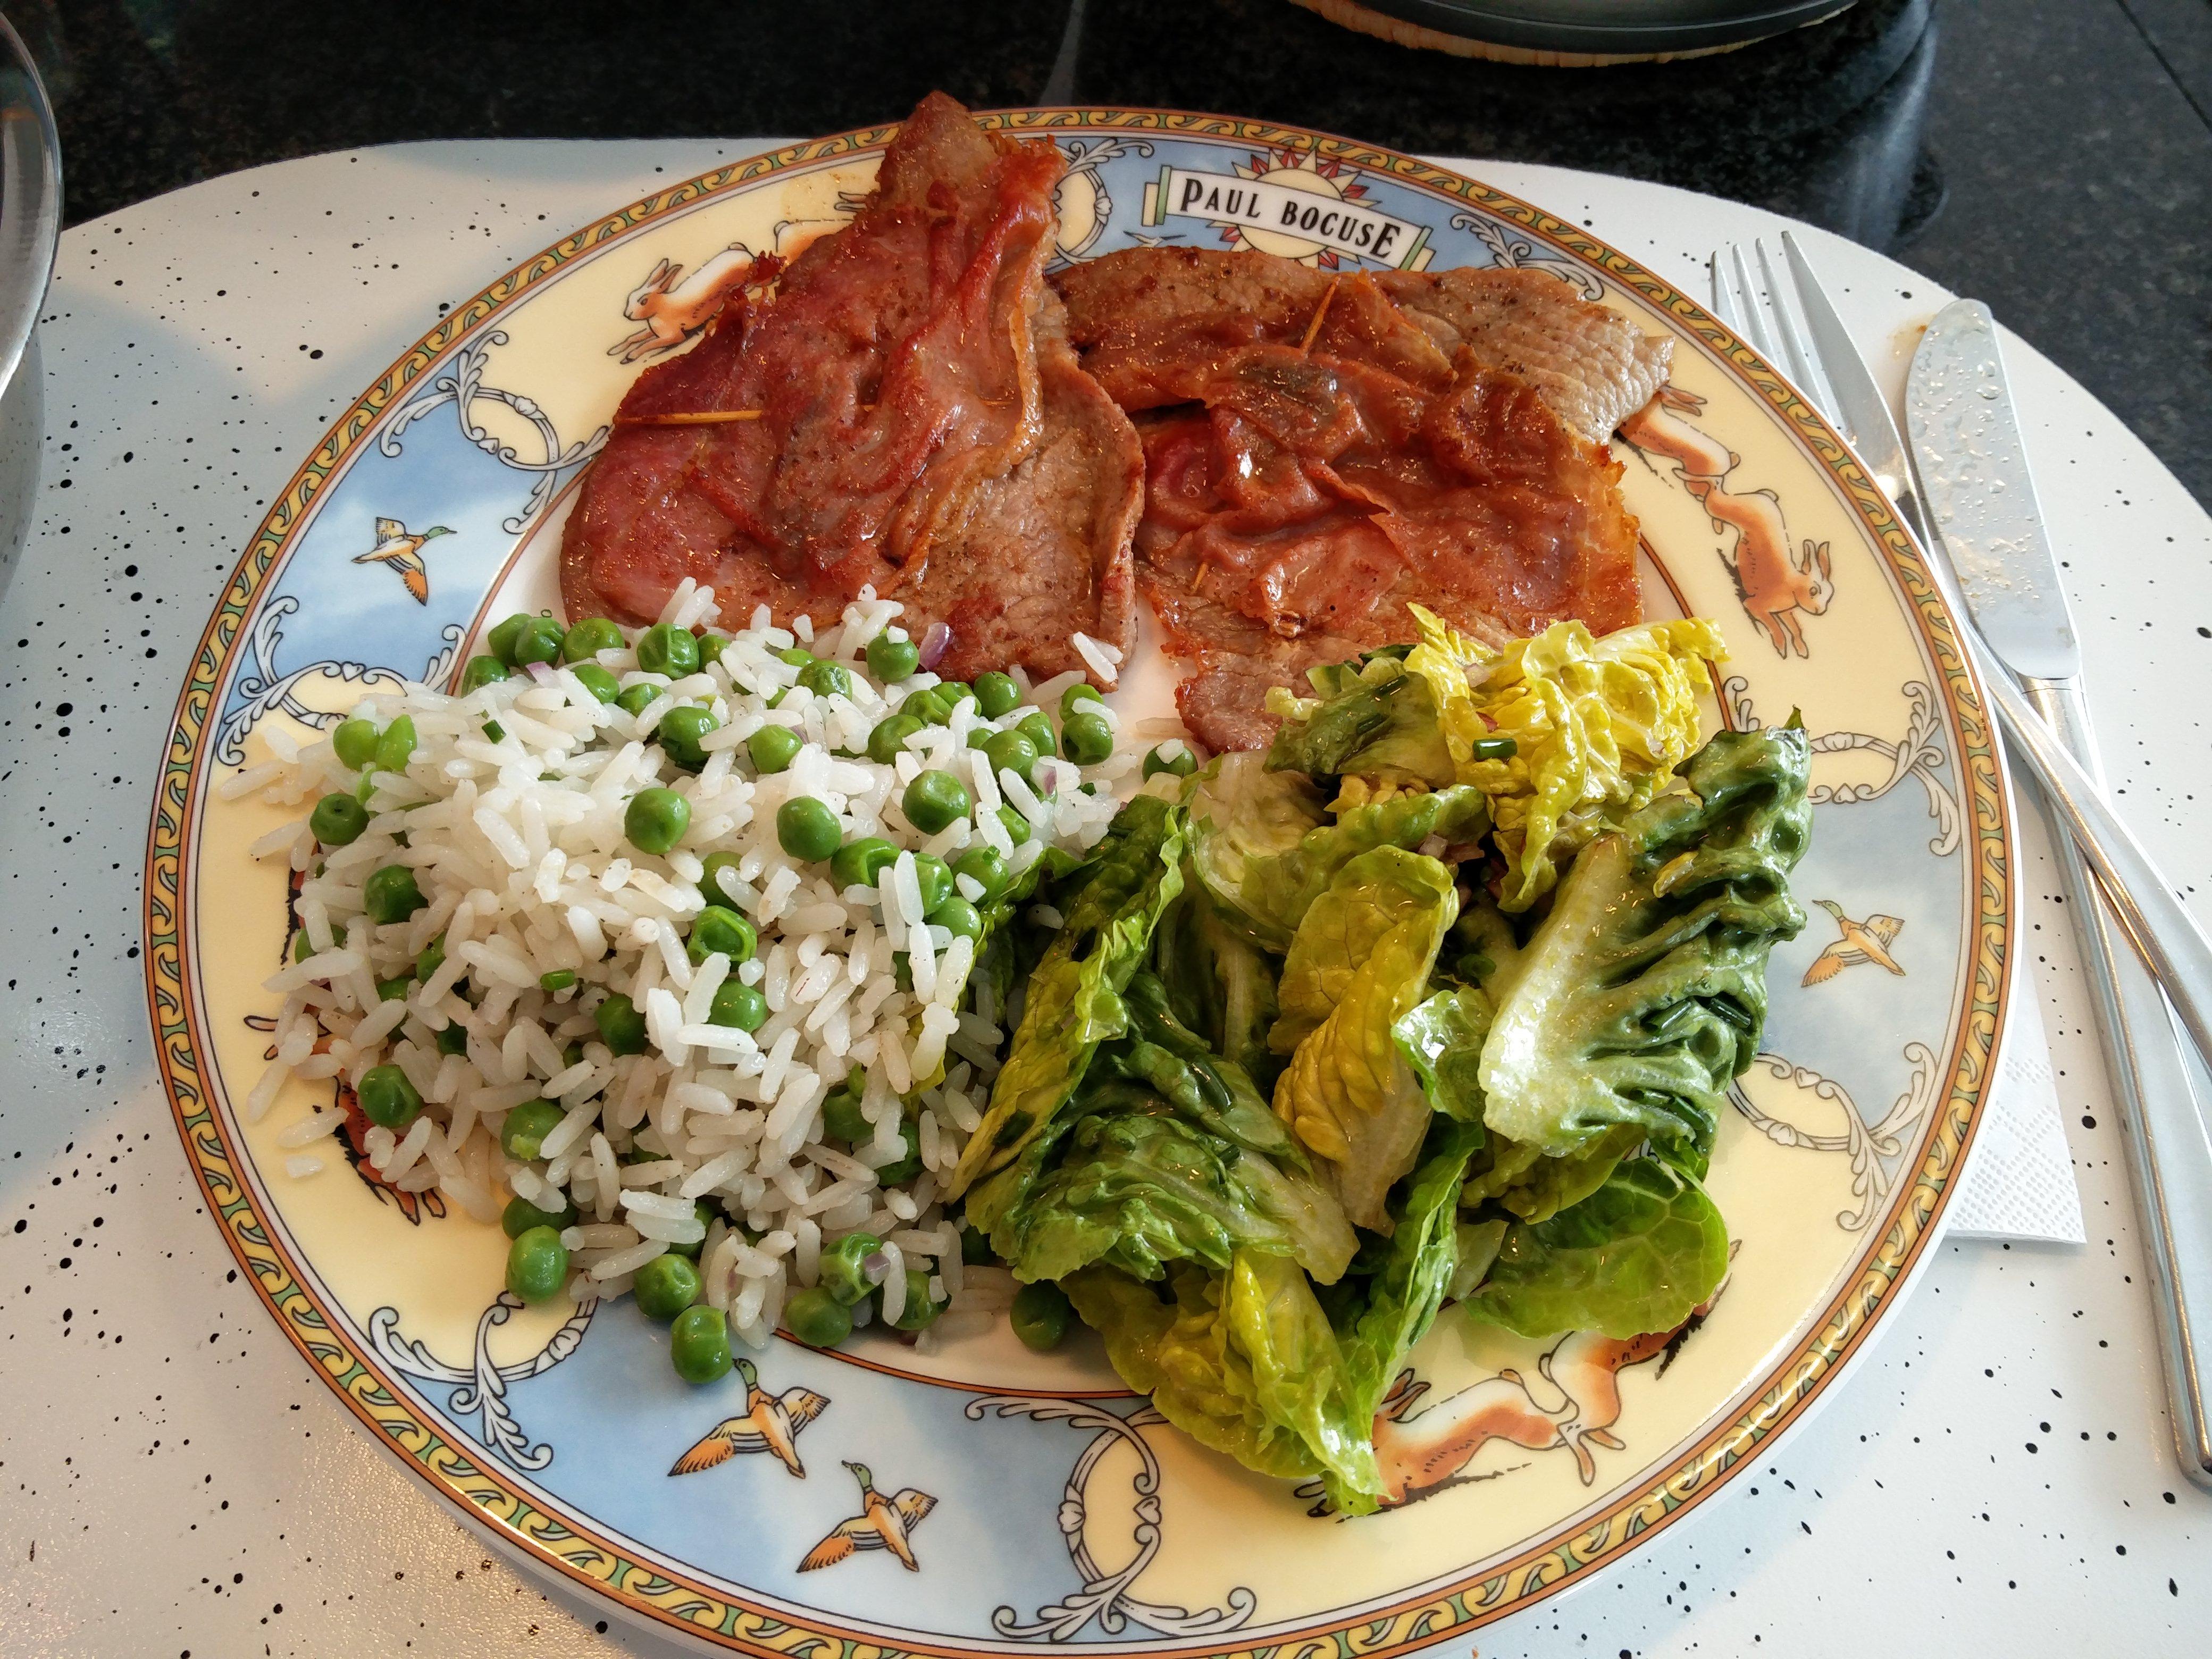 http://foodloader.net/nico_2016-04-10_saltimbocca-mit-reis-und-salat.jpg